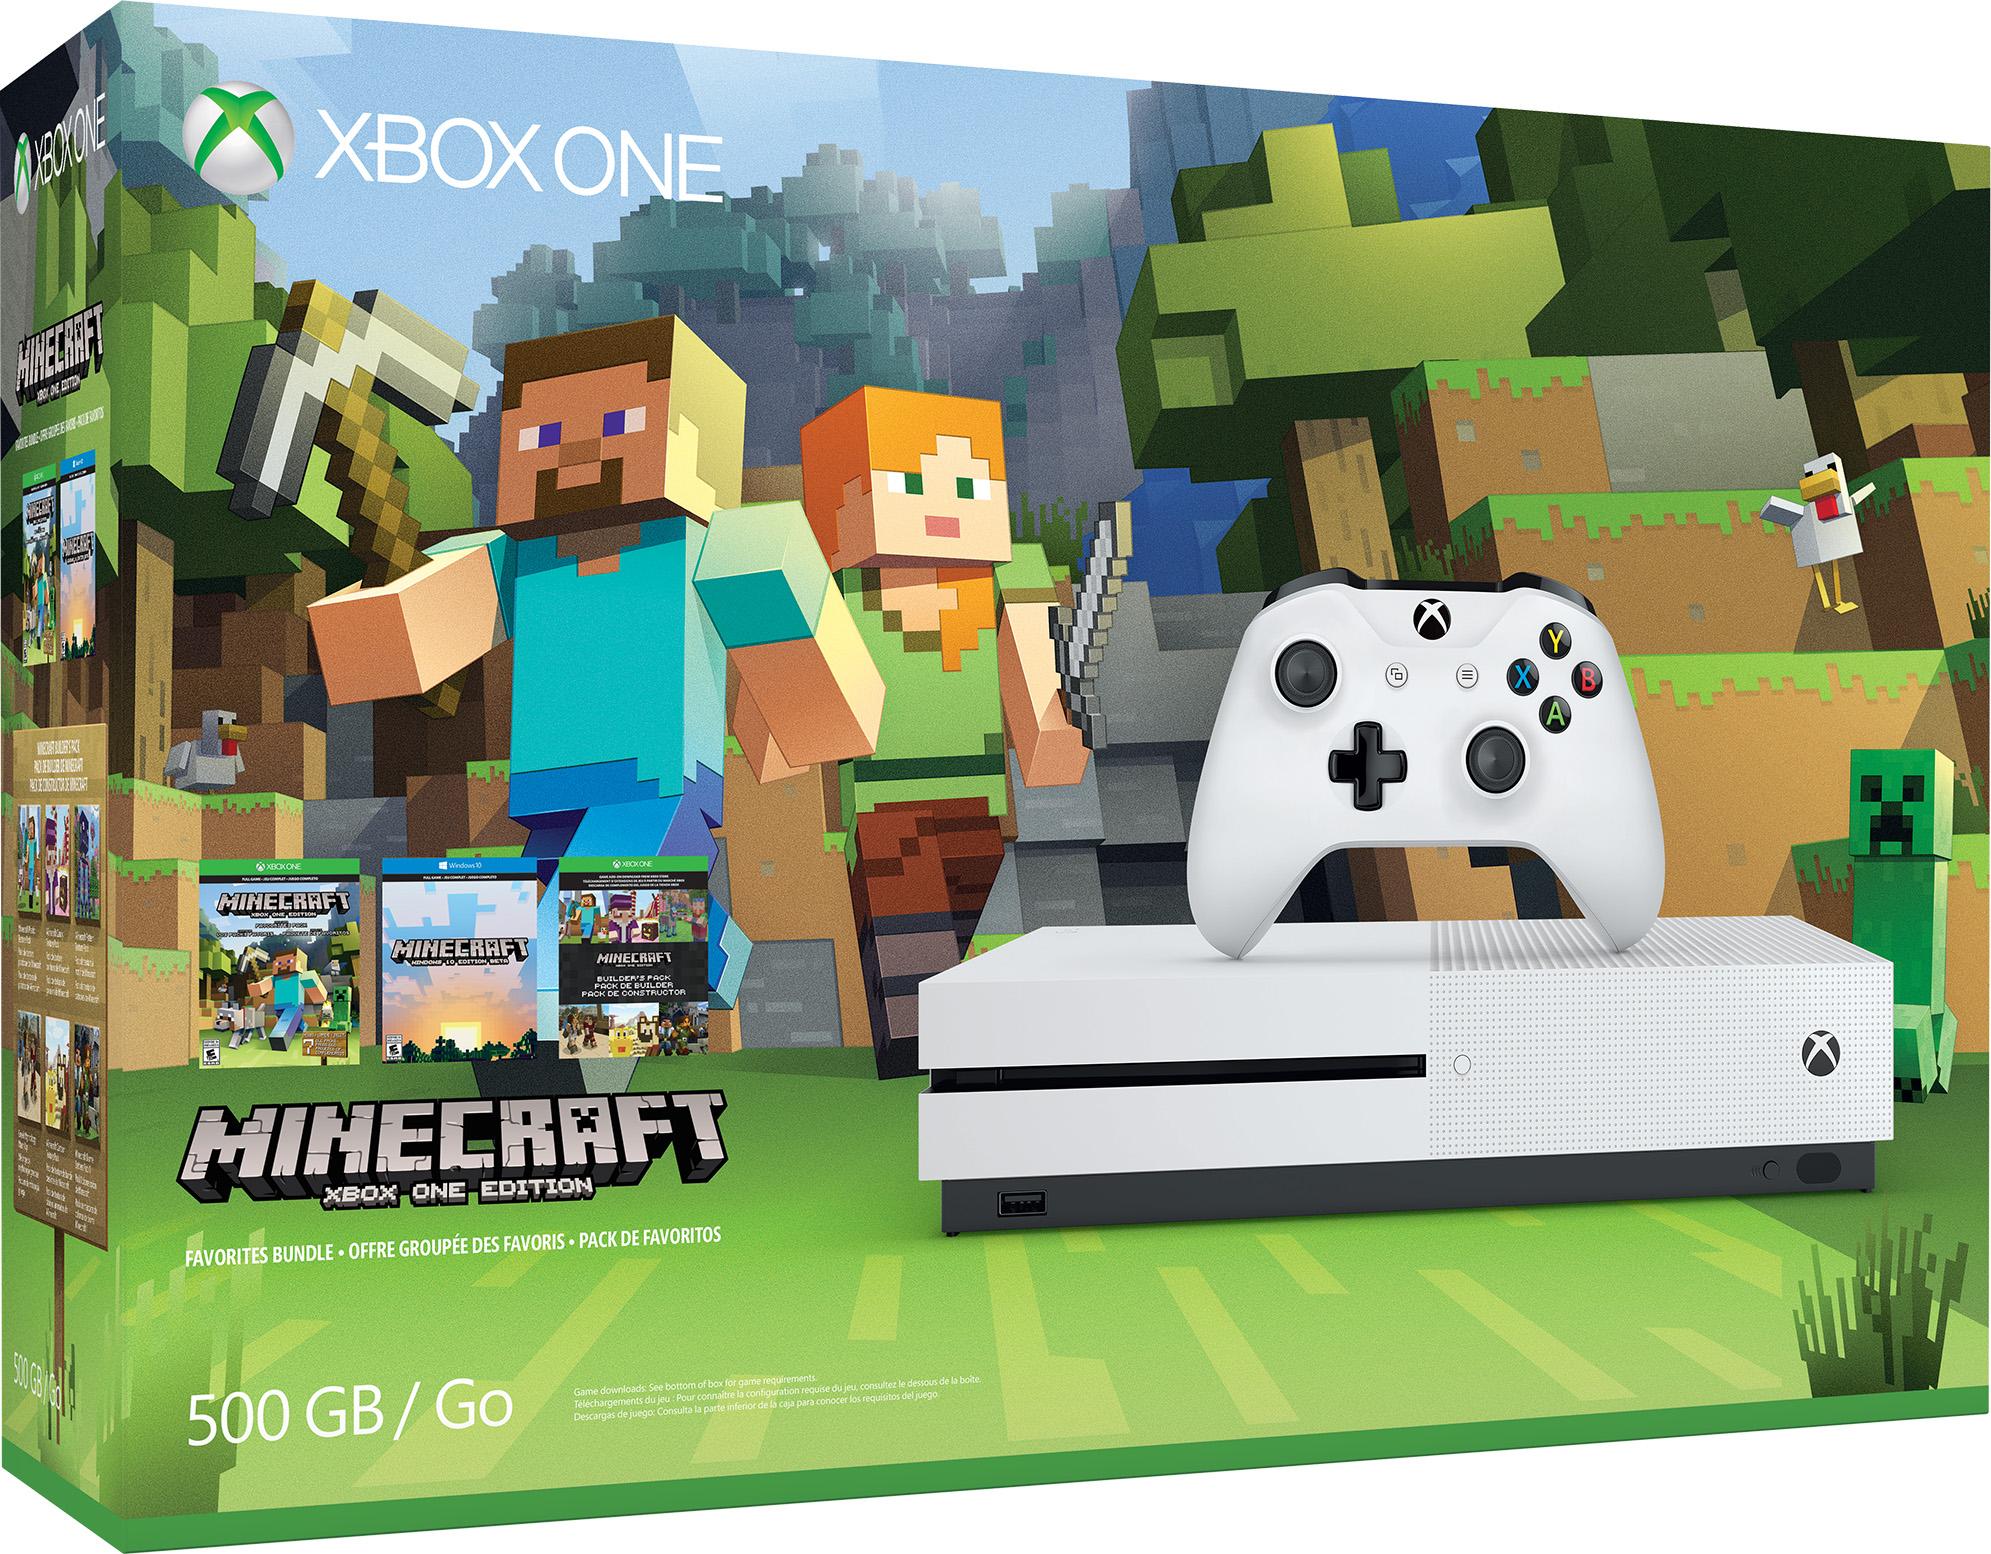 Xbox One S Minecraft Favorites Bundel (500 GB)